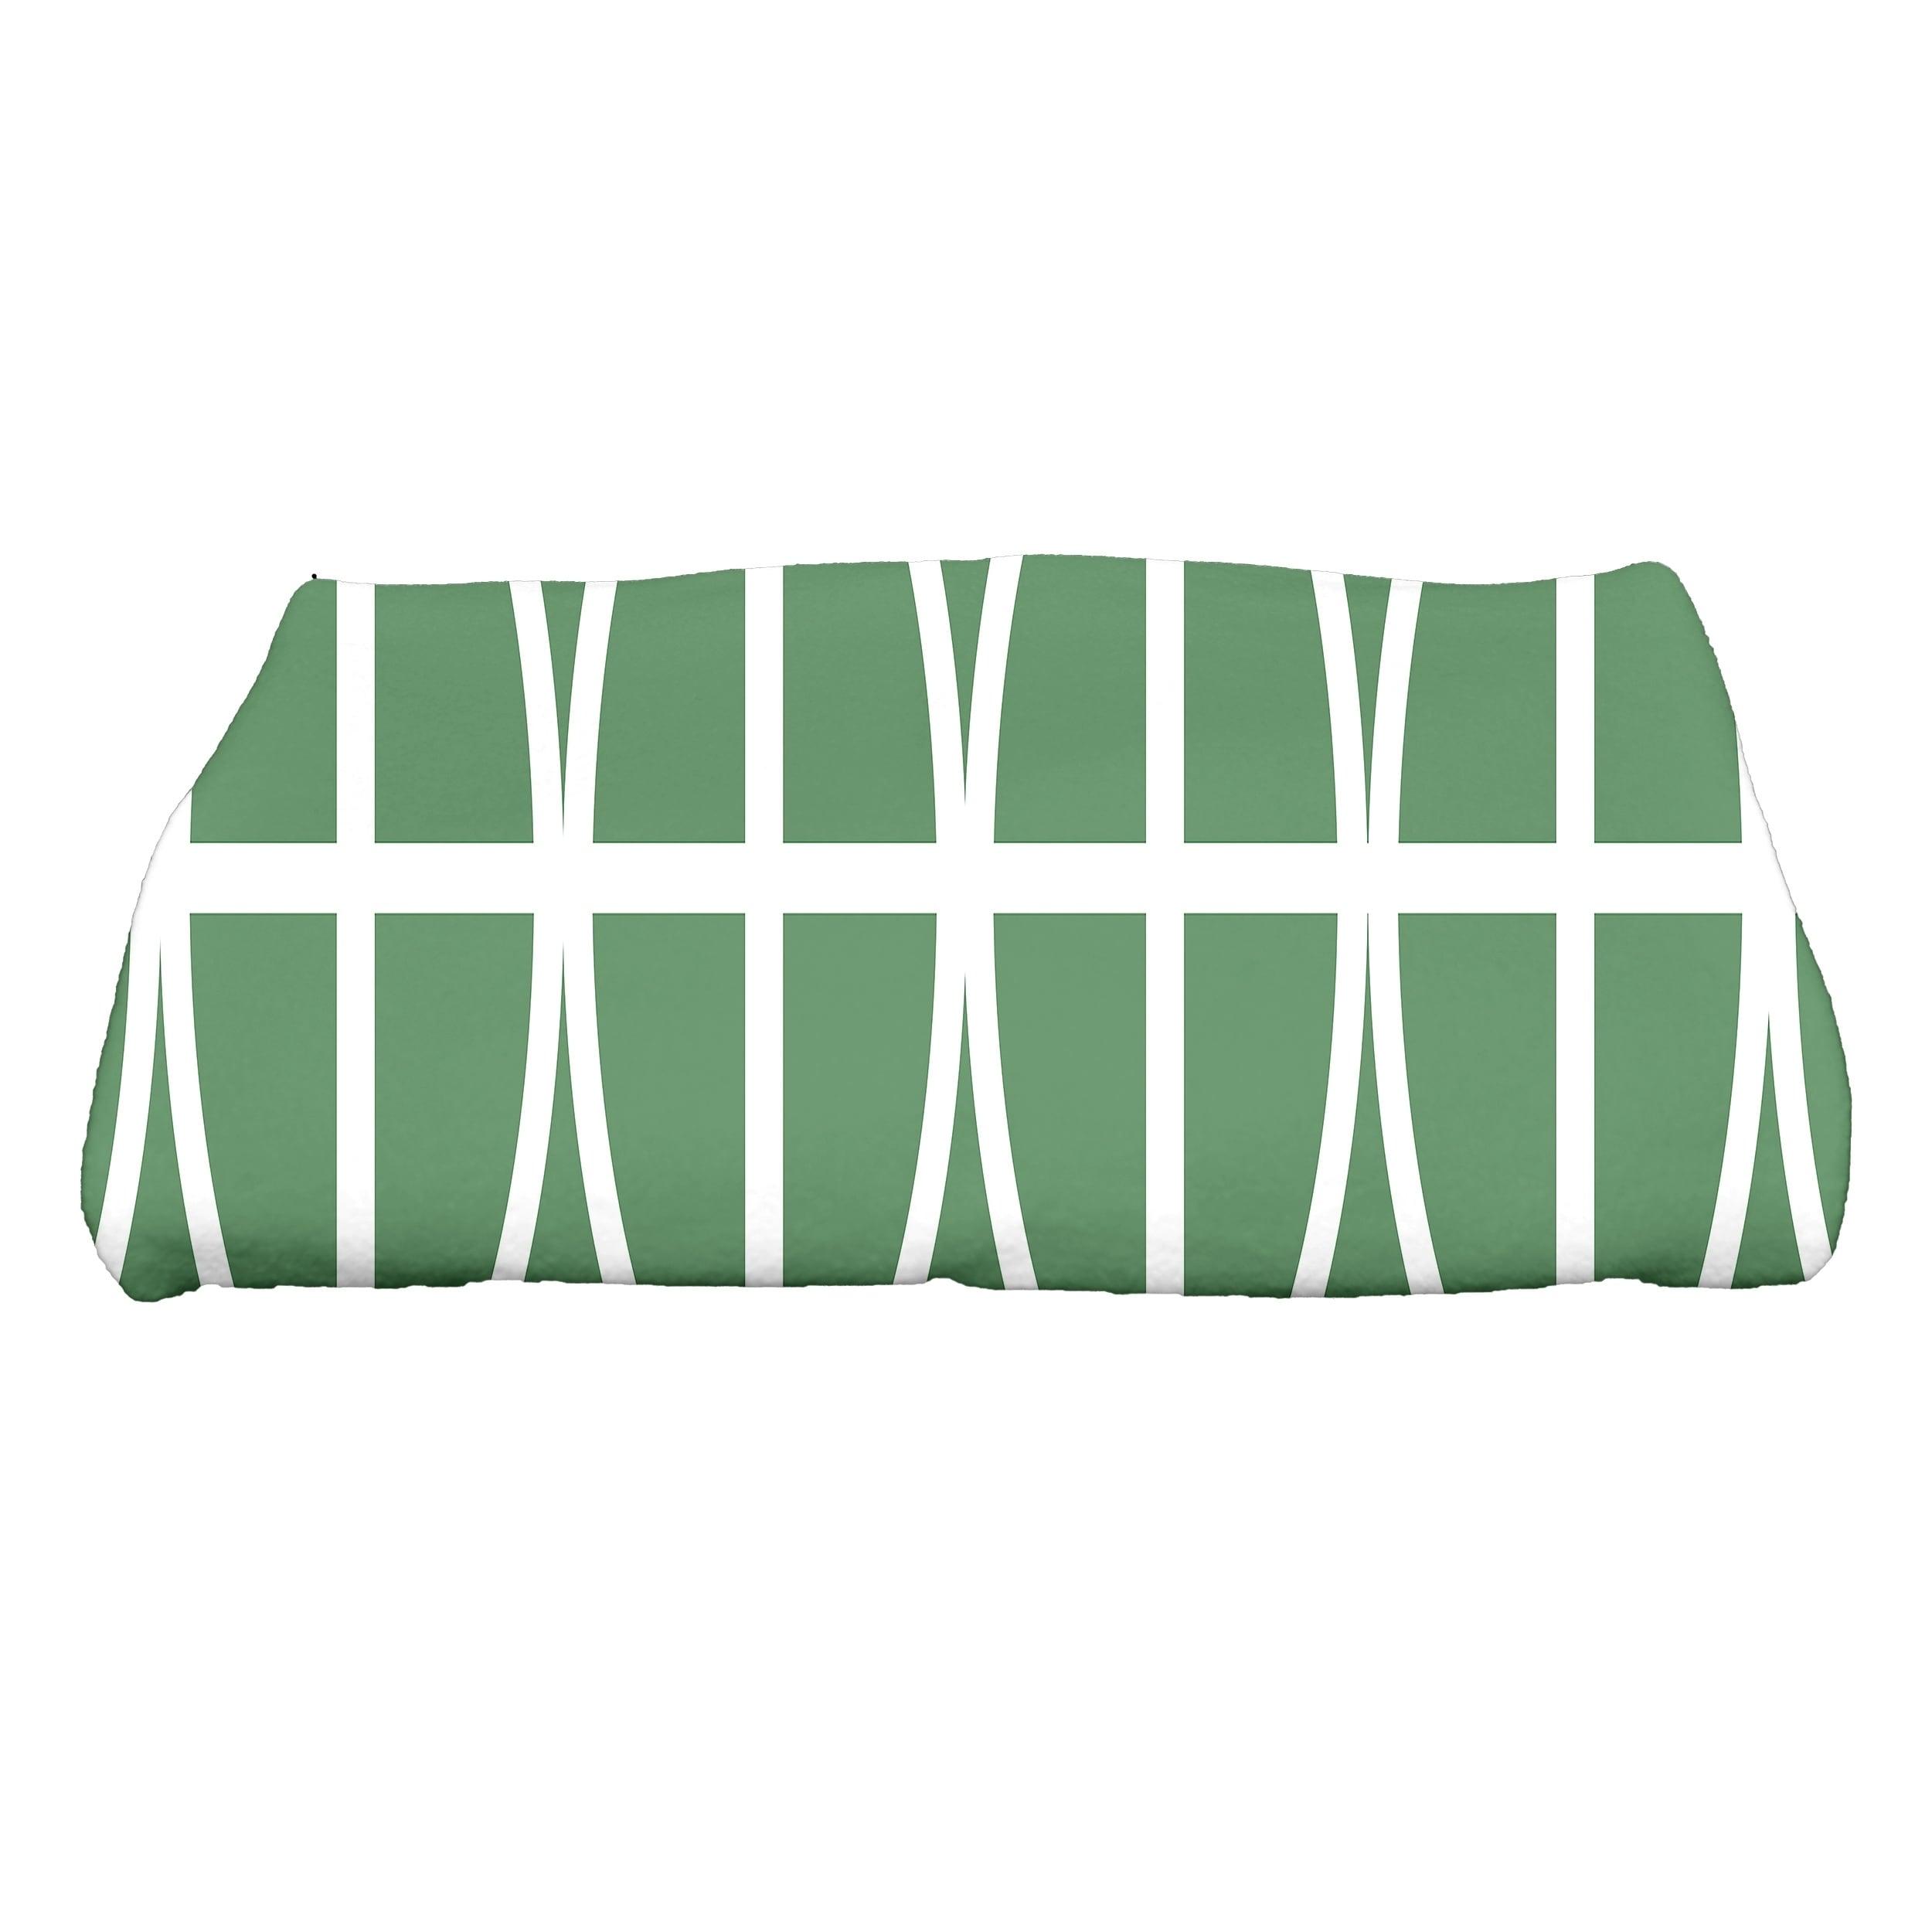 30 X 60 Inch Ovals And Stripes Geometric Print Bath Towel On Sale Overstock 19684297